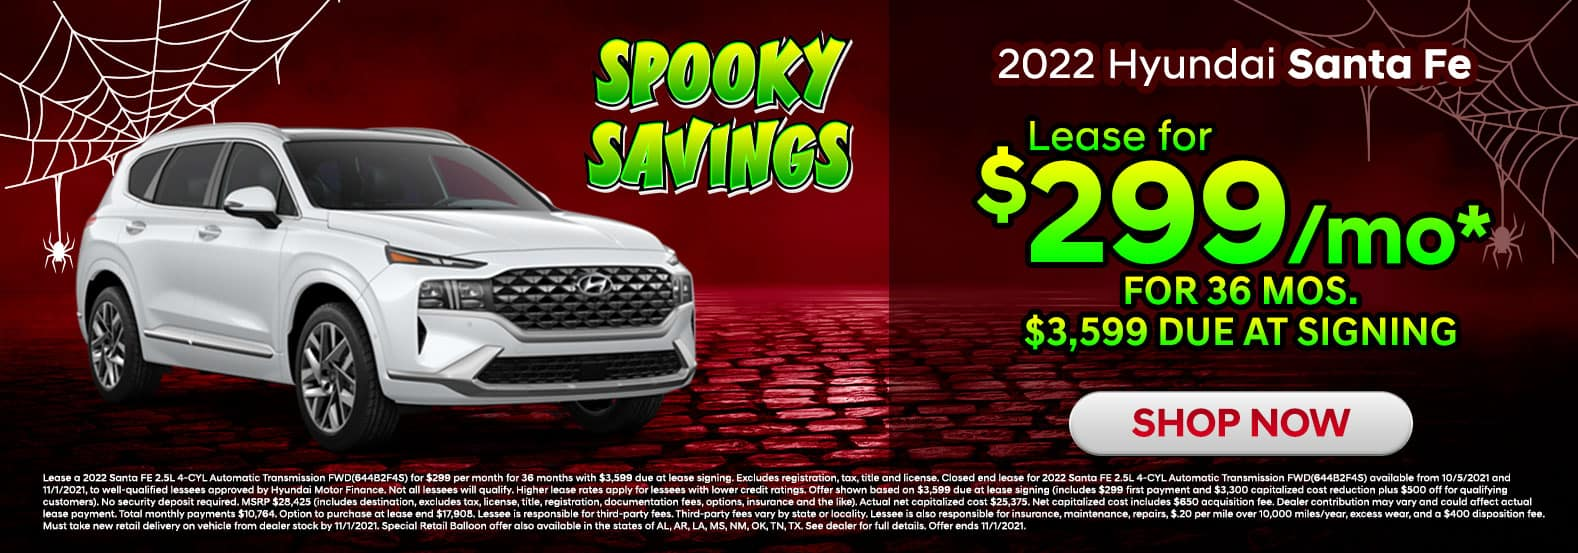 2022 Hyundai Santa Fe October Offer in Sherman, TX